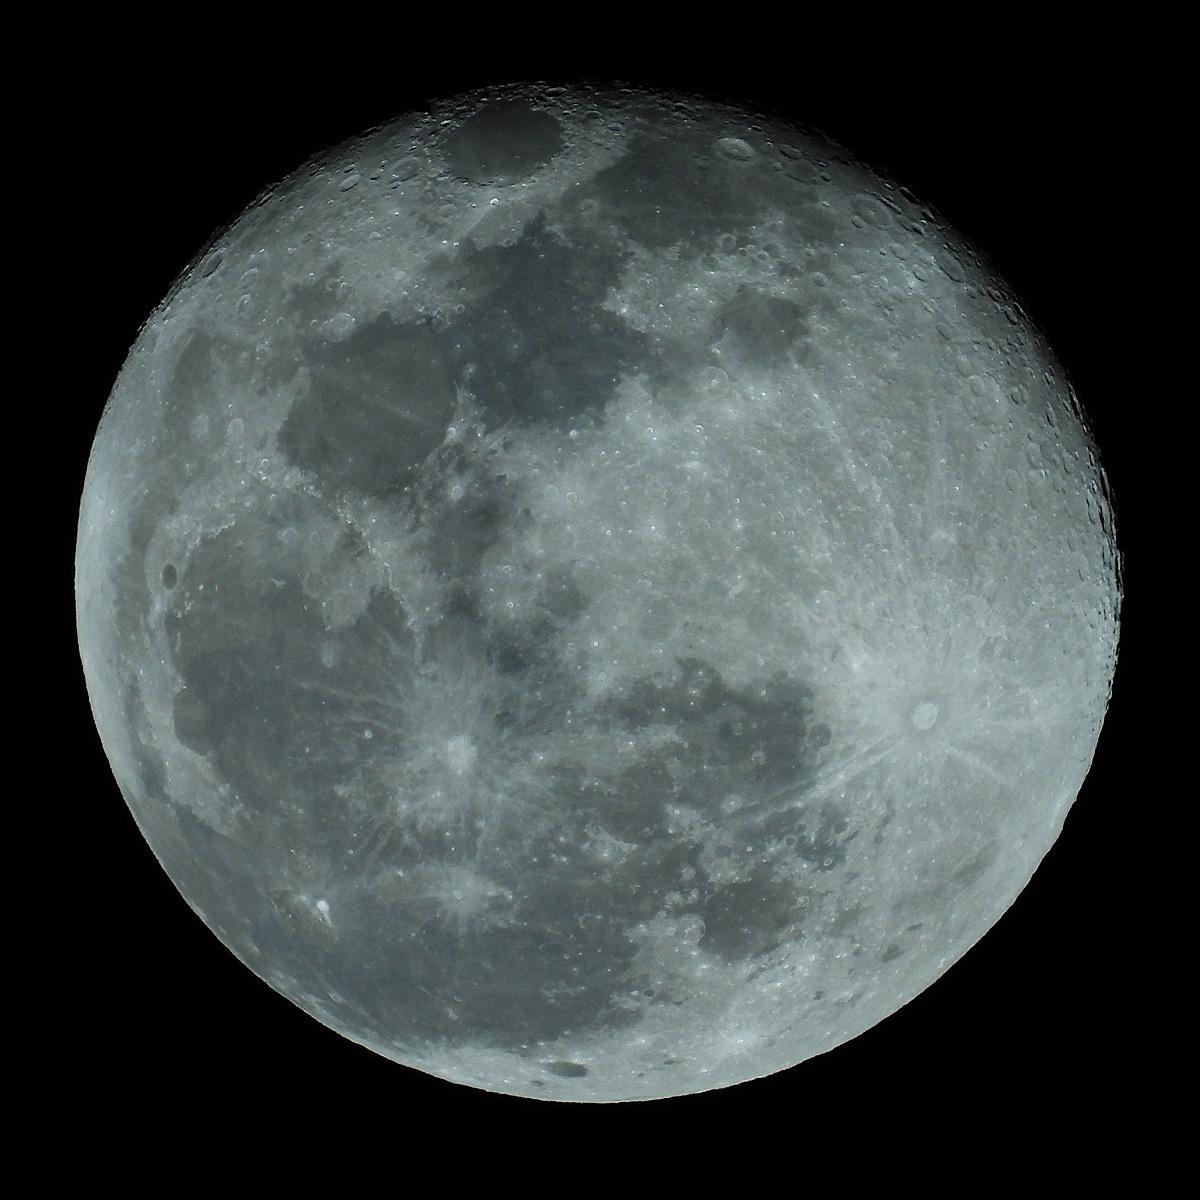 moon-20190122-DSCN2283.jpg